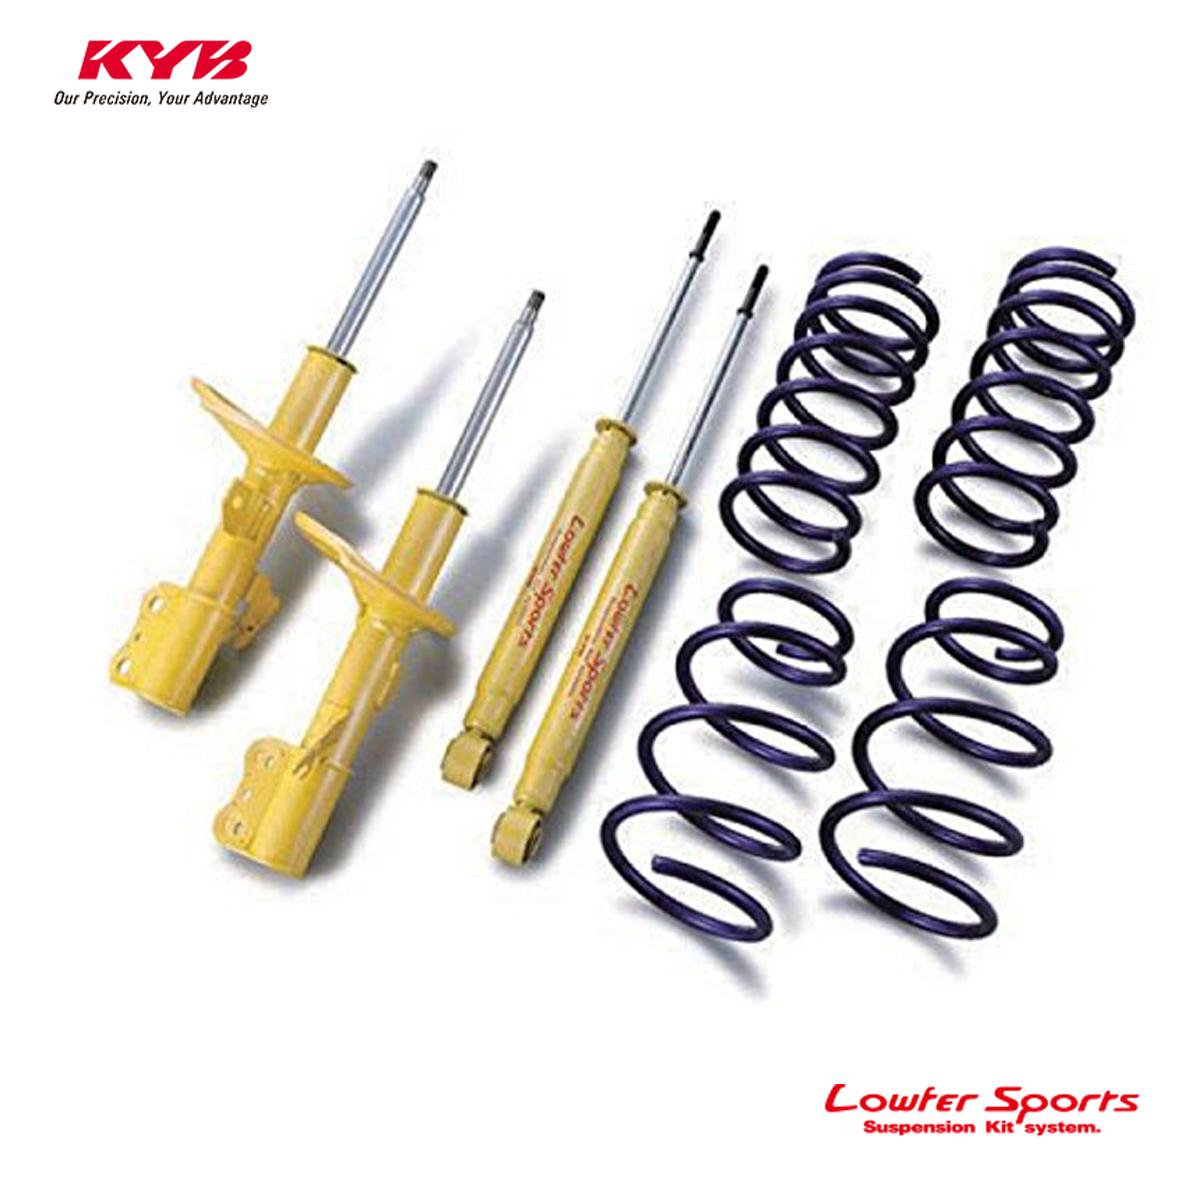 KYB カヤバ ファミリアSワゴン BJFW ショックアブソーバー サスペンションキット Lowfer Sports LKIT-BJFW 配送先条件有り